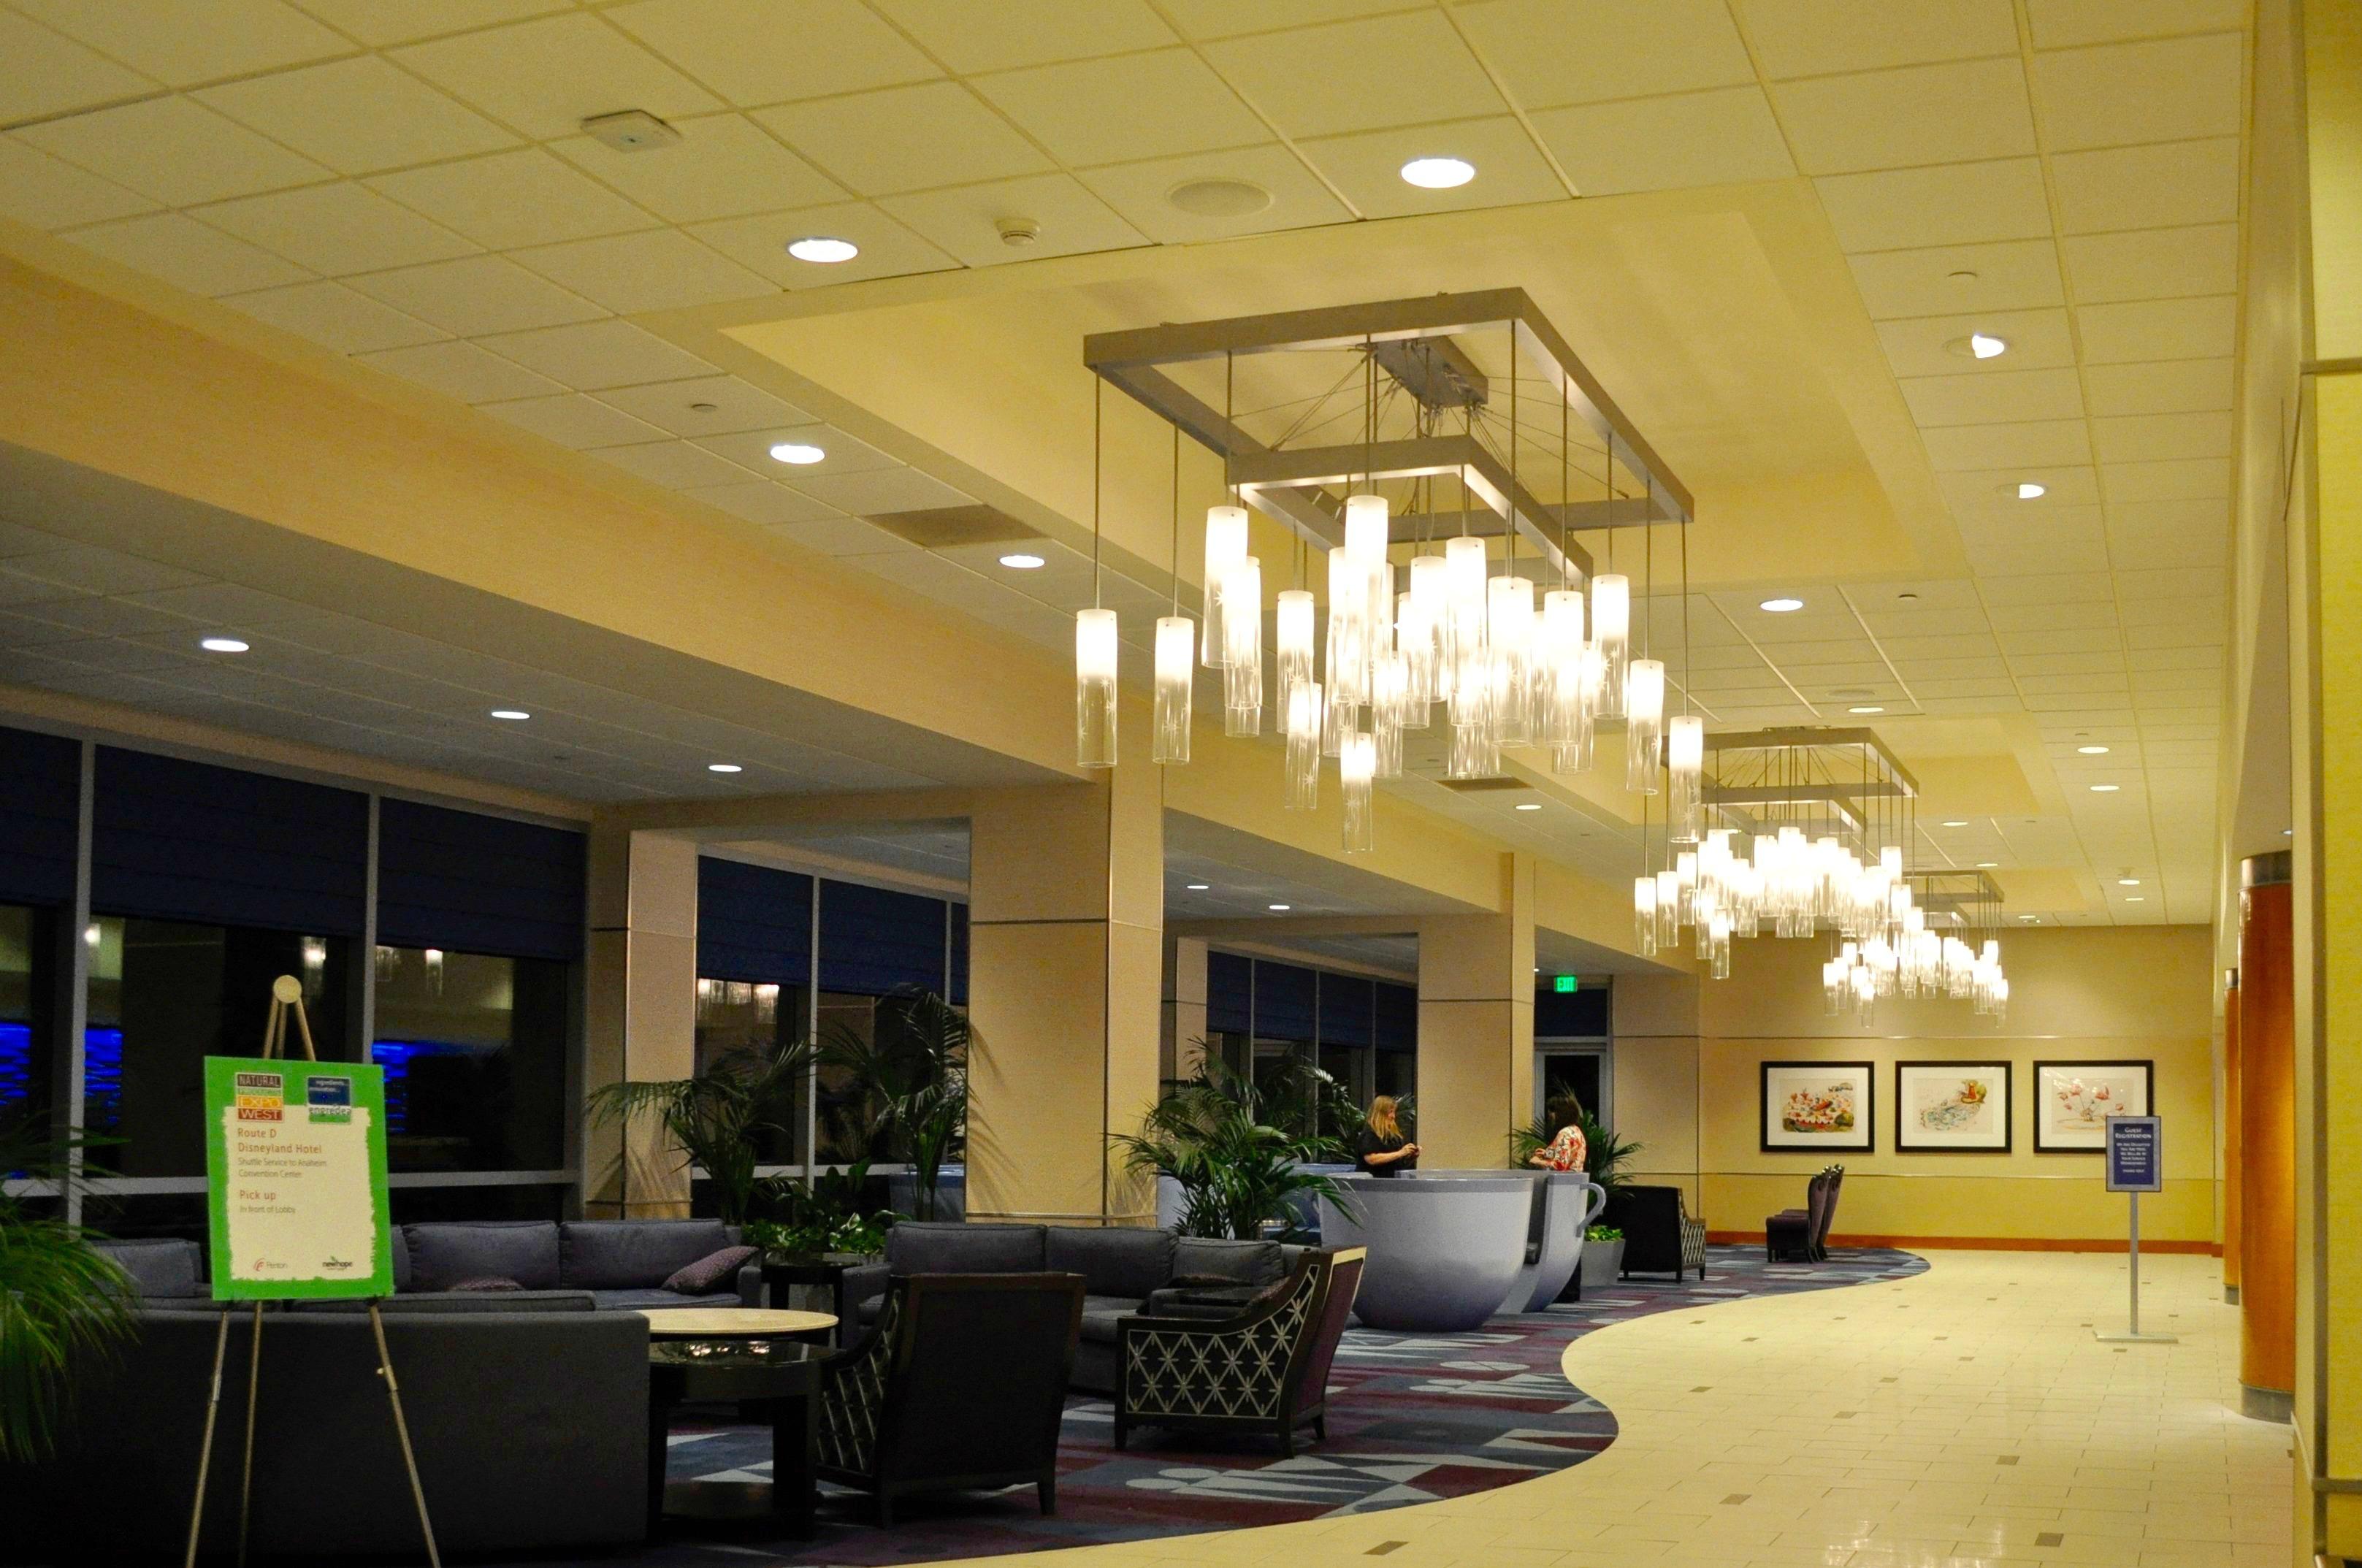 Disneyland Hotel Lobby - Simple Sojourns